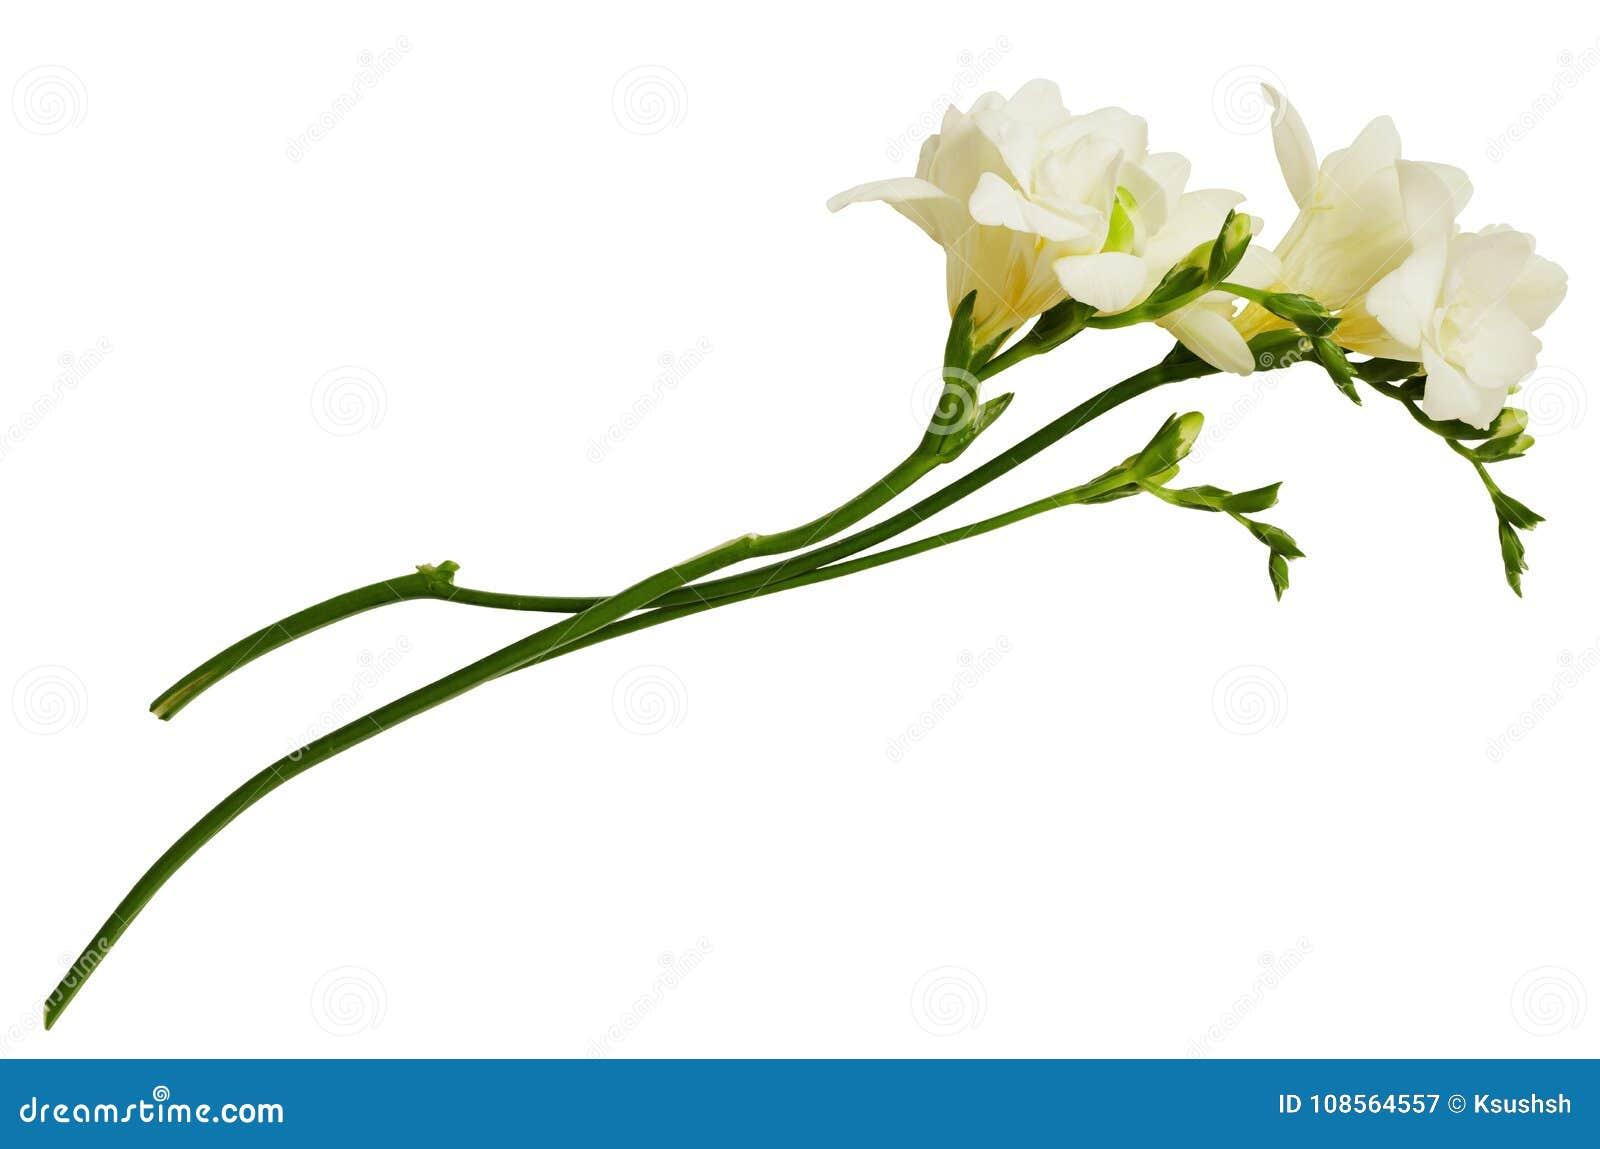 White Freesia Flowers Stock Image Image Of Fresh Twig 108564557